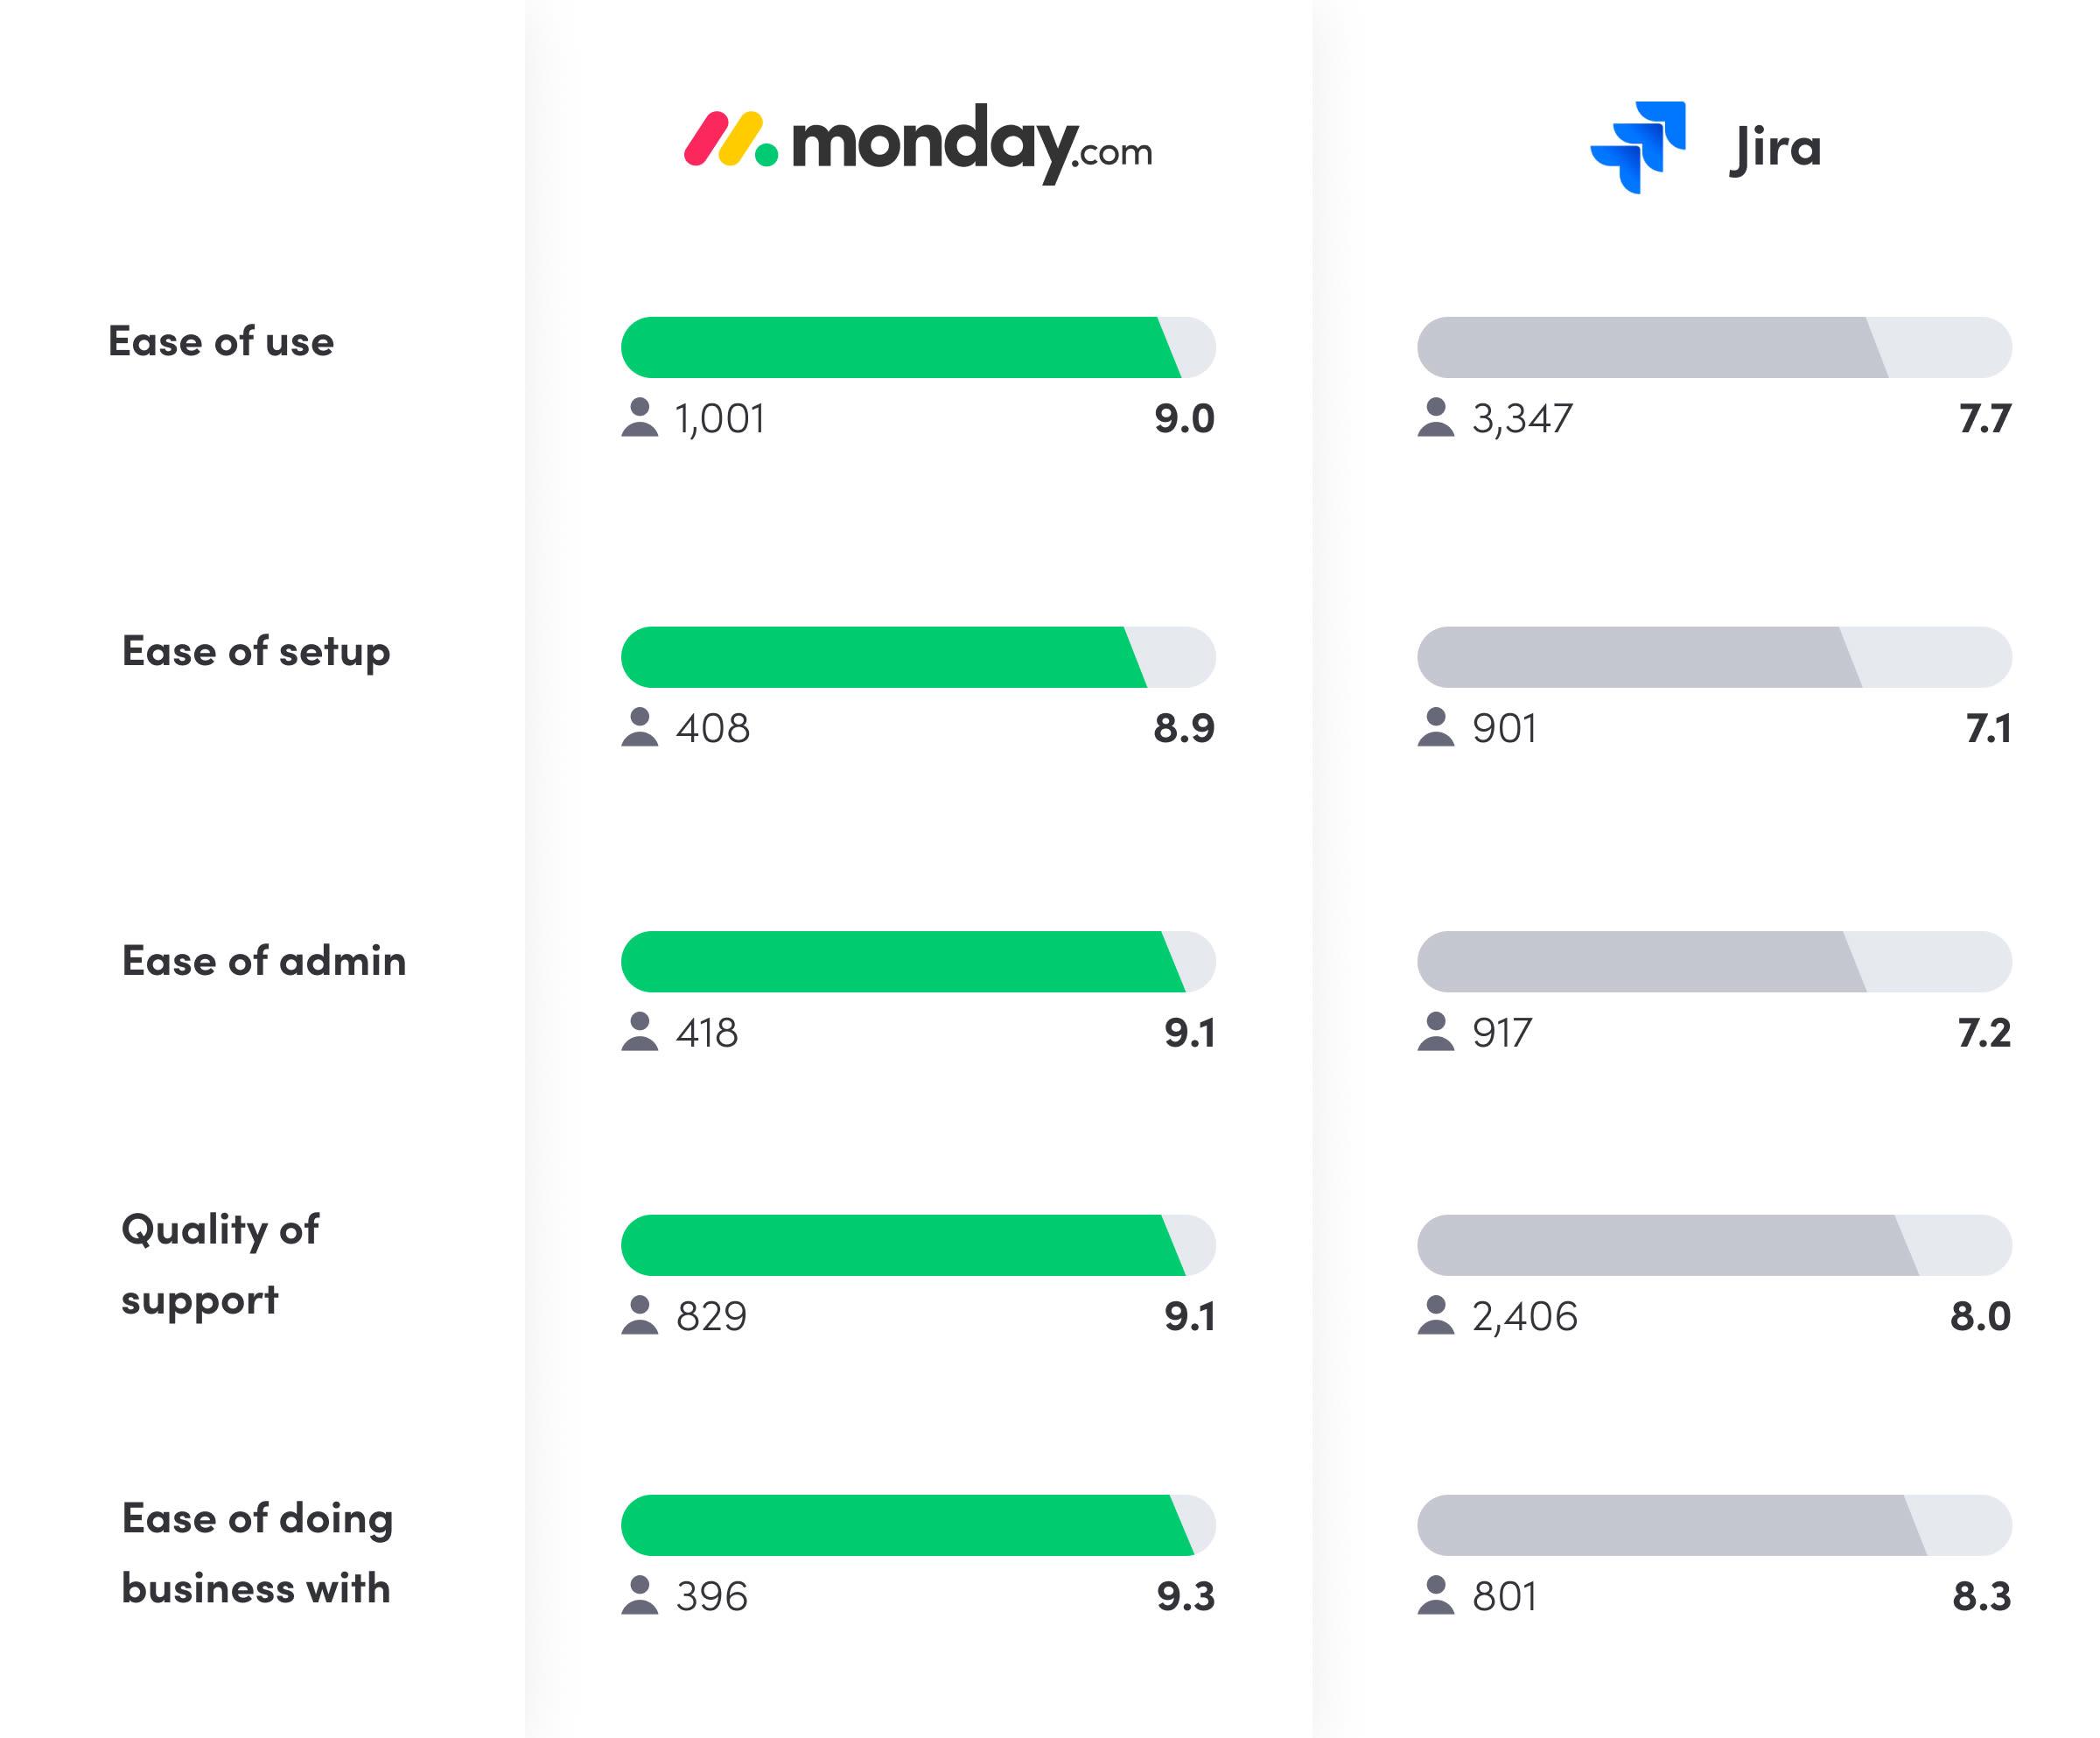 Jira vs. monday.com reviews chart from G2